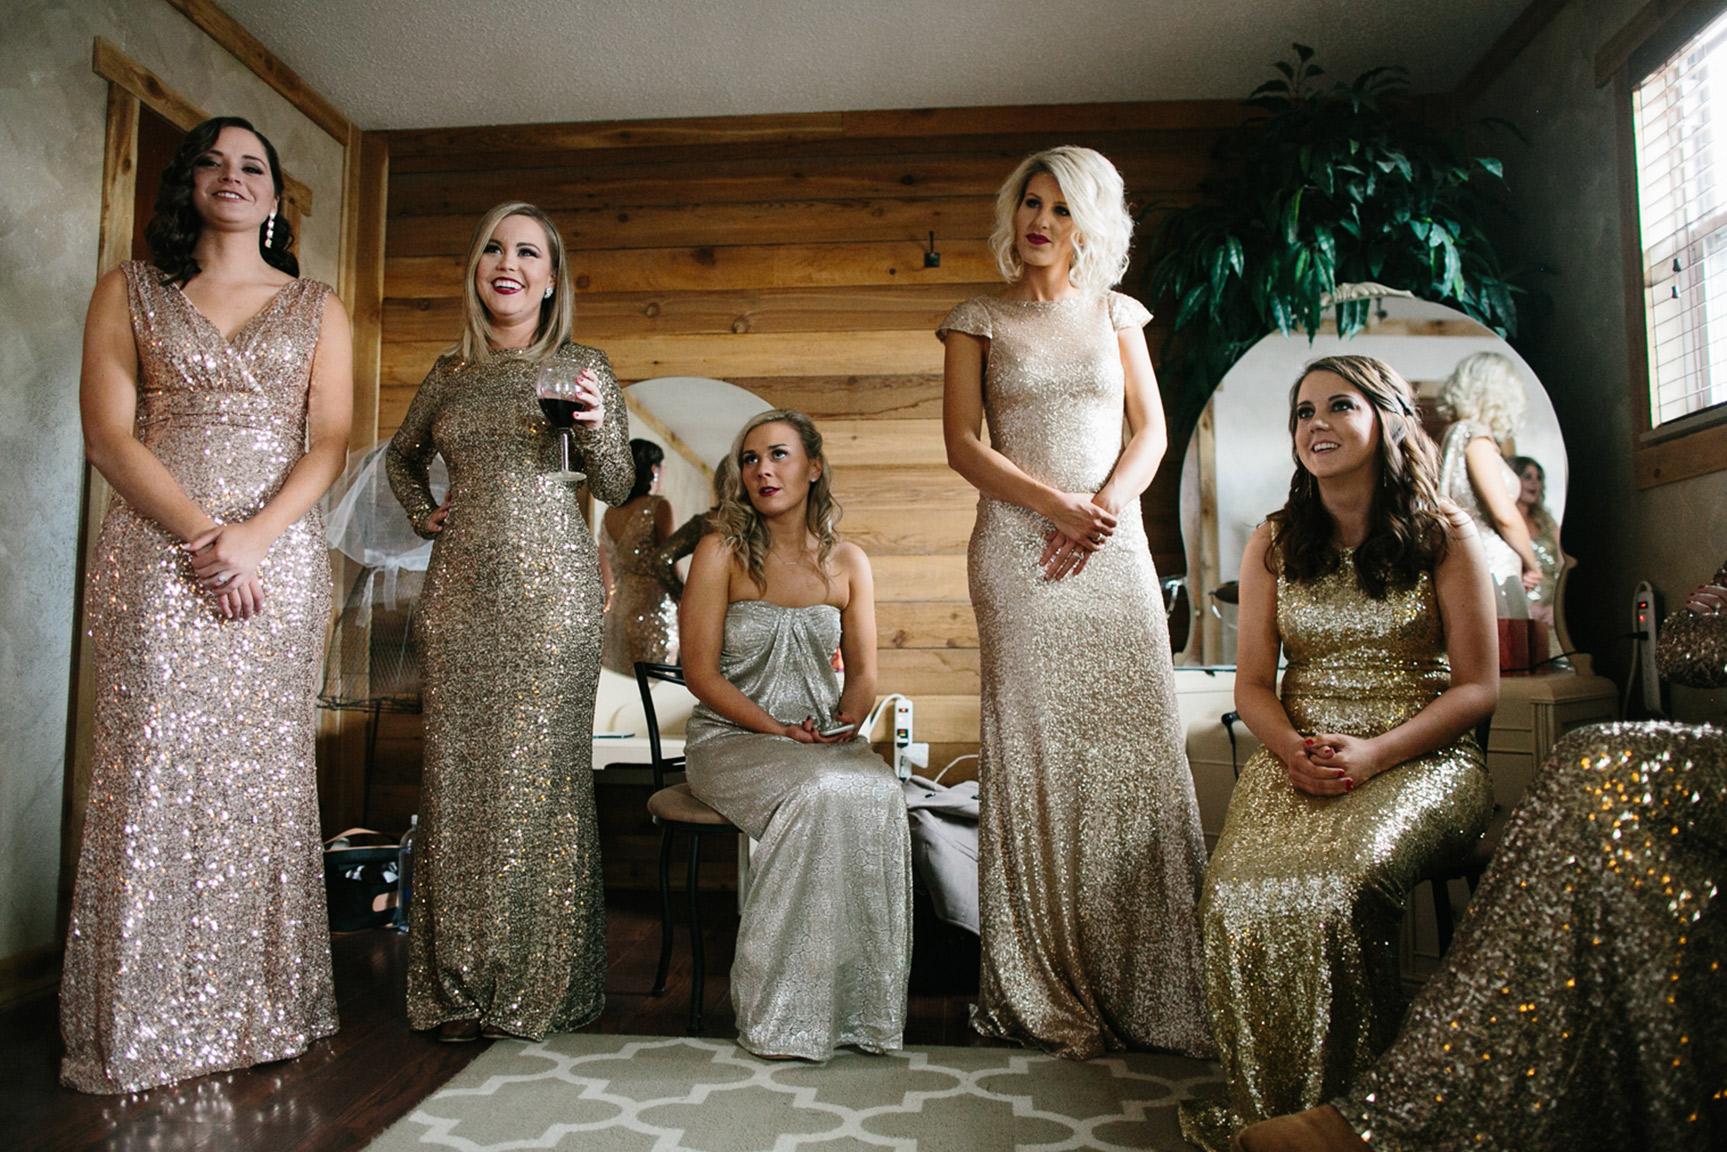 Cotton_Creek_Barn_Winter_Wedding_WeddingPhotographer005.jpg